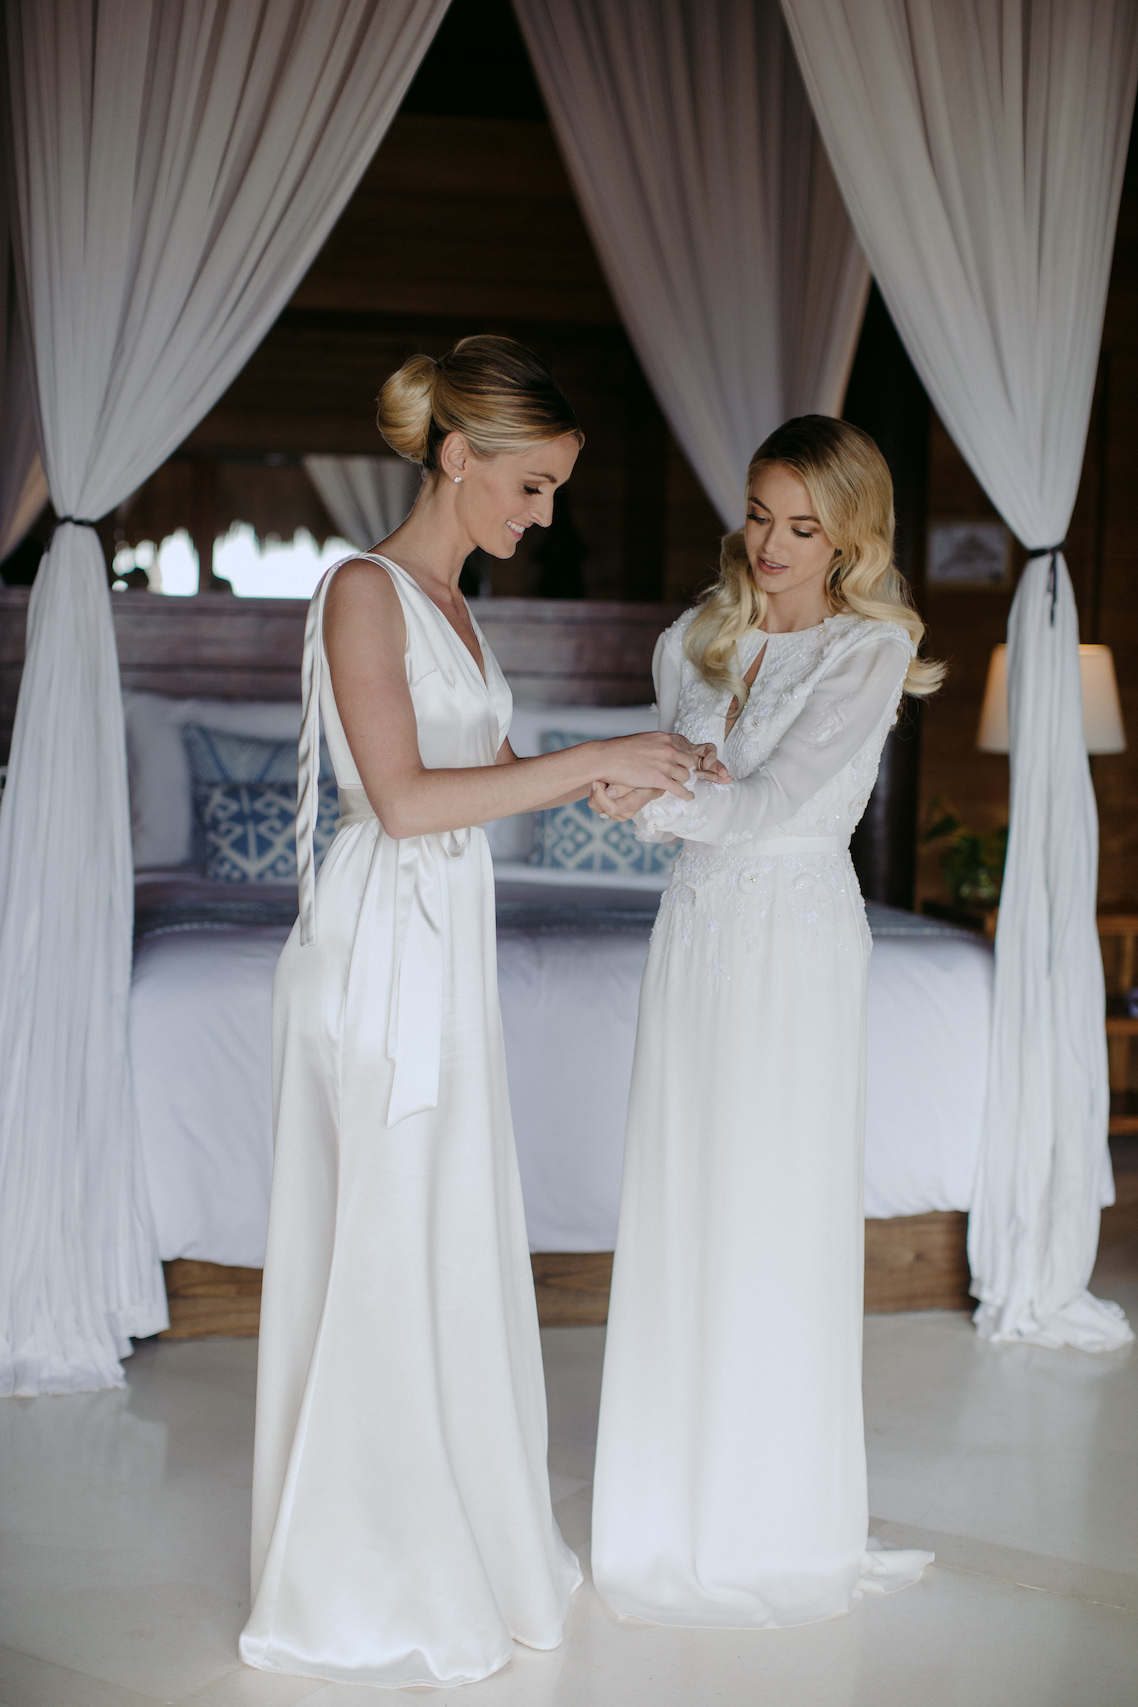 kaitlyn_brody_wedding-290.jpg